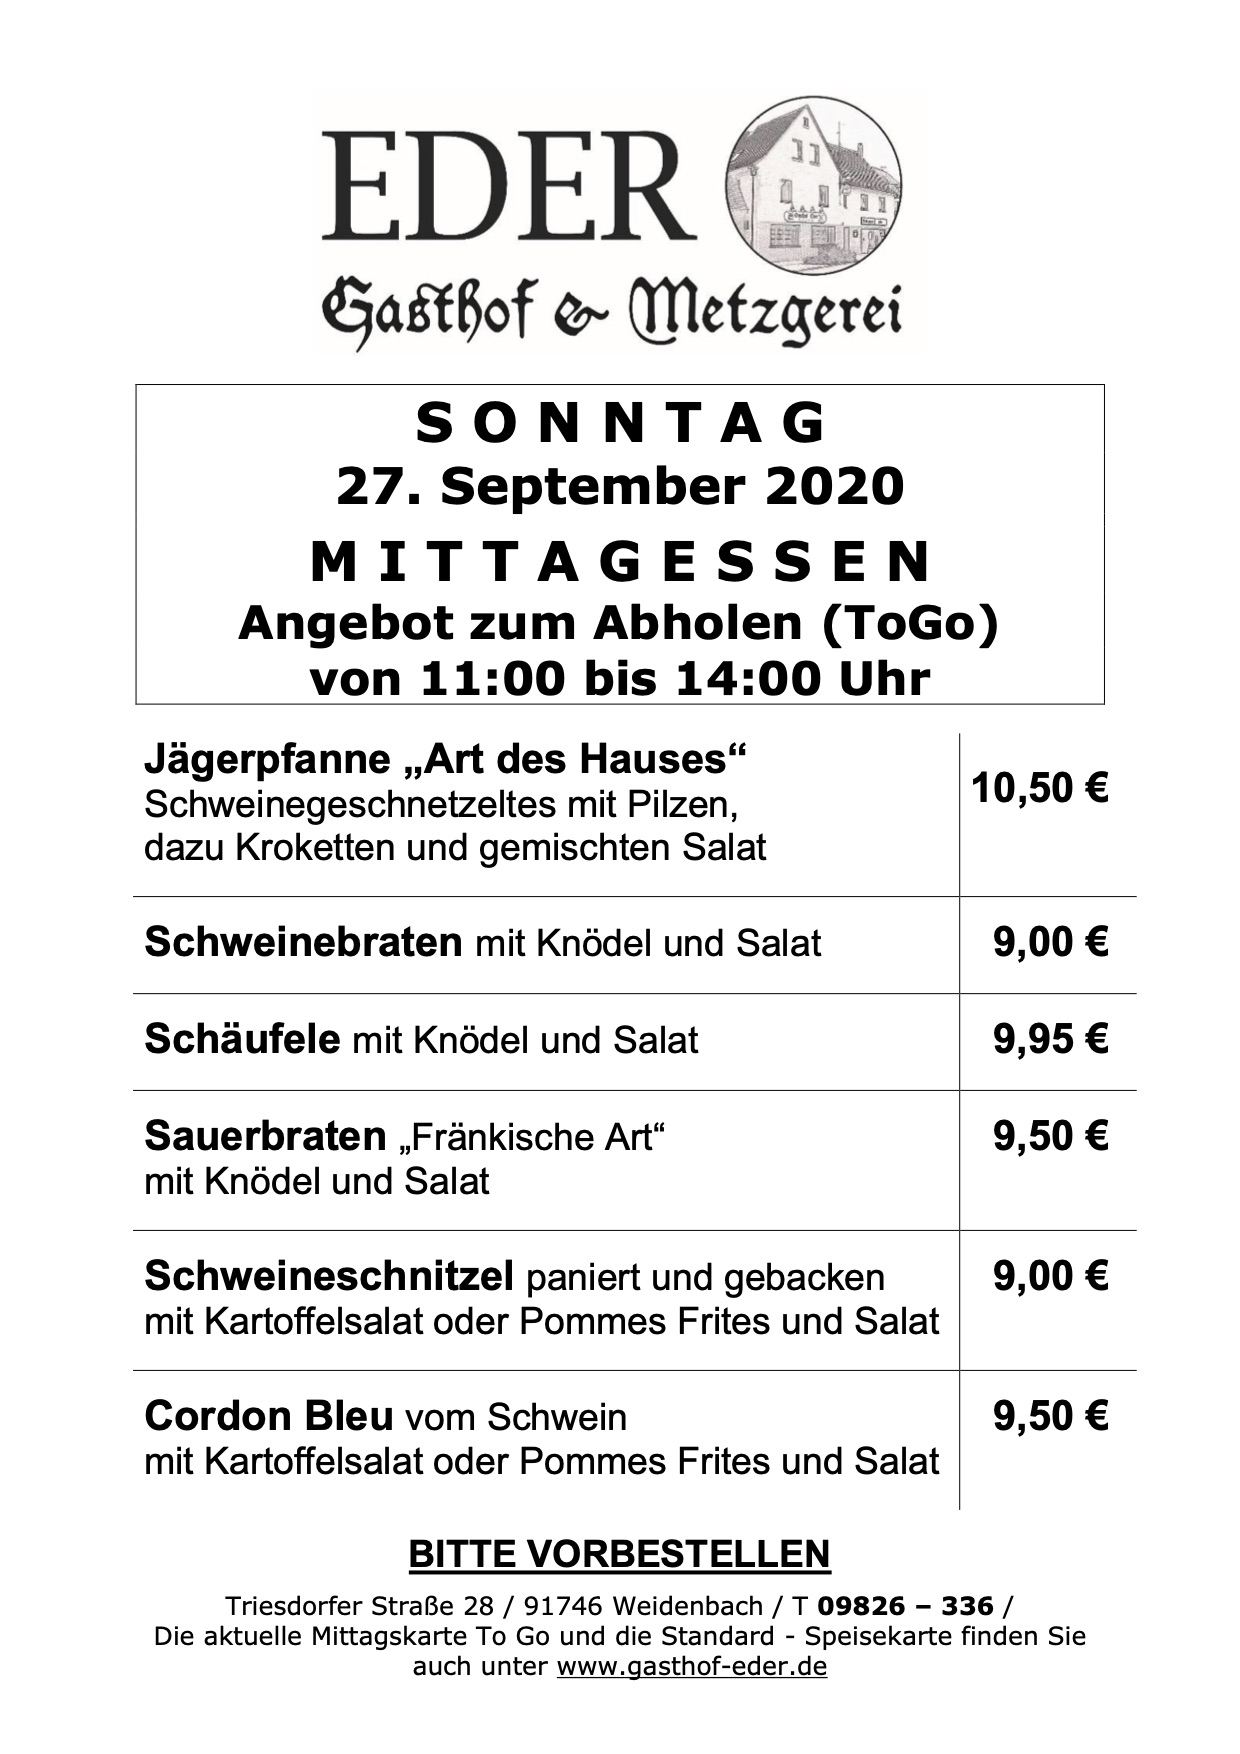 Sonntag_27.09.2020